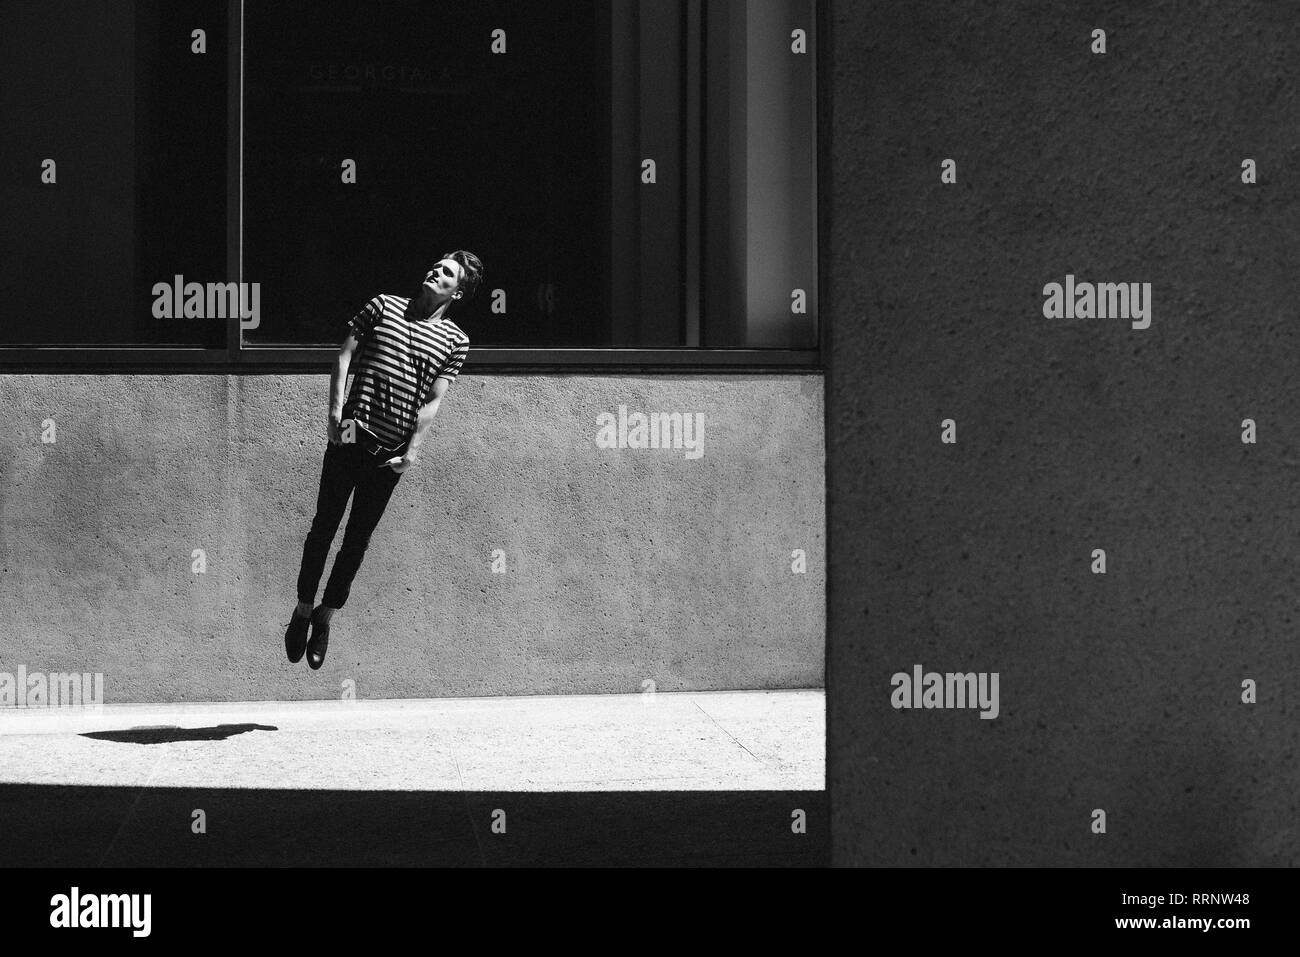 Young man jumping on urban sidewalk Stock Photo